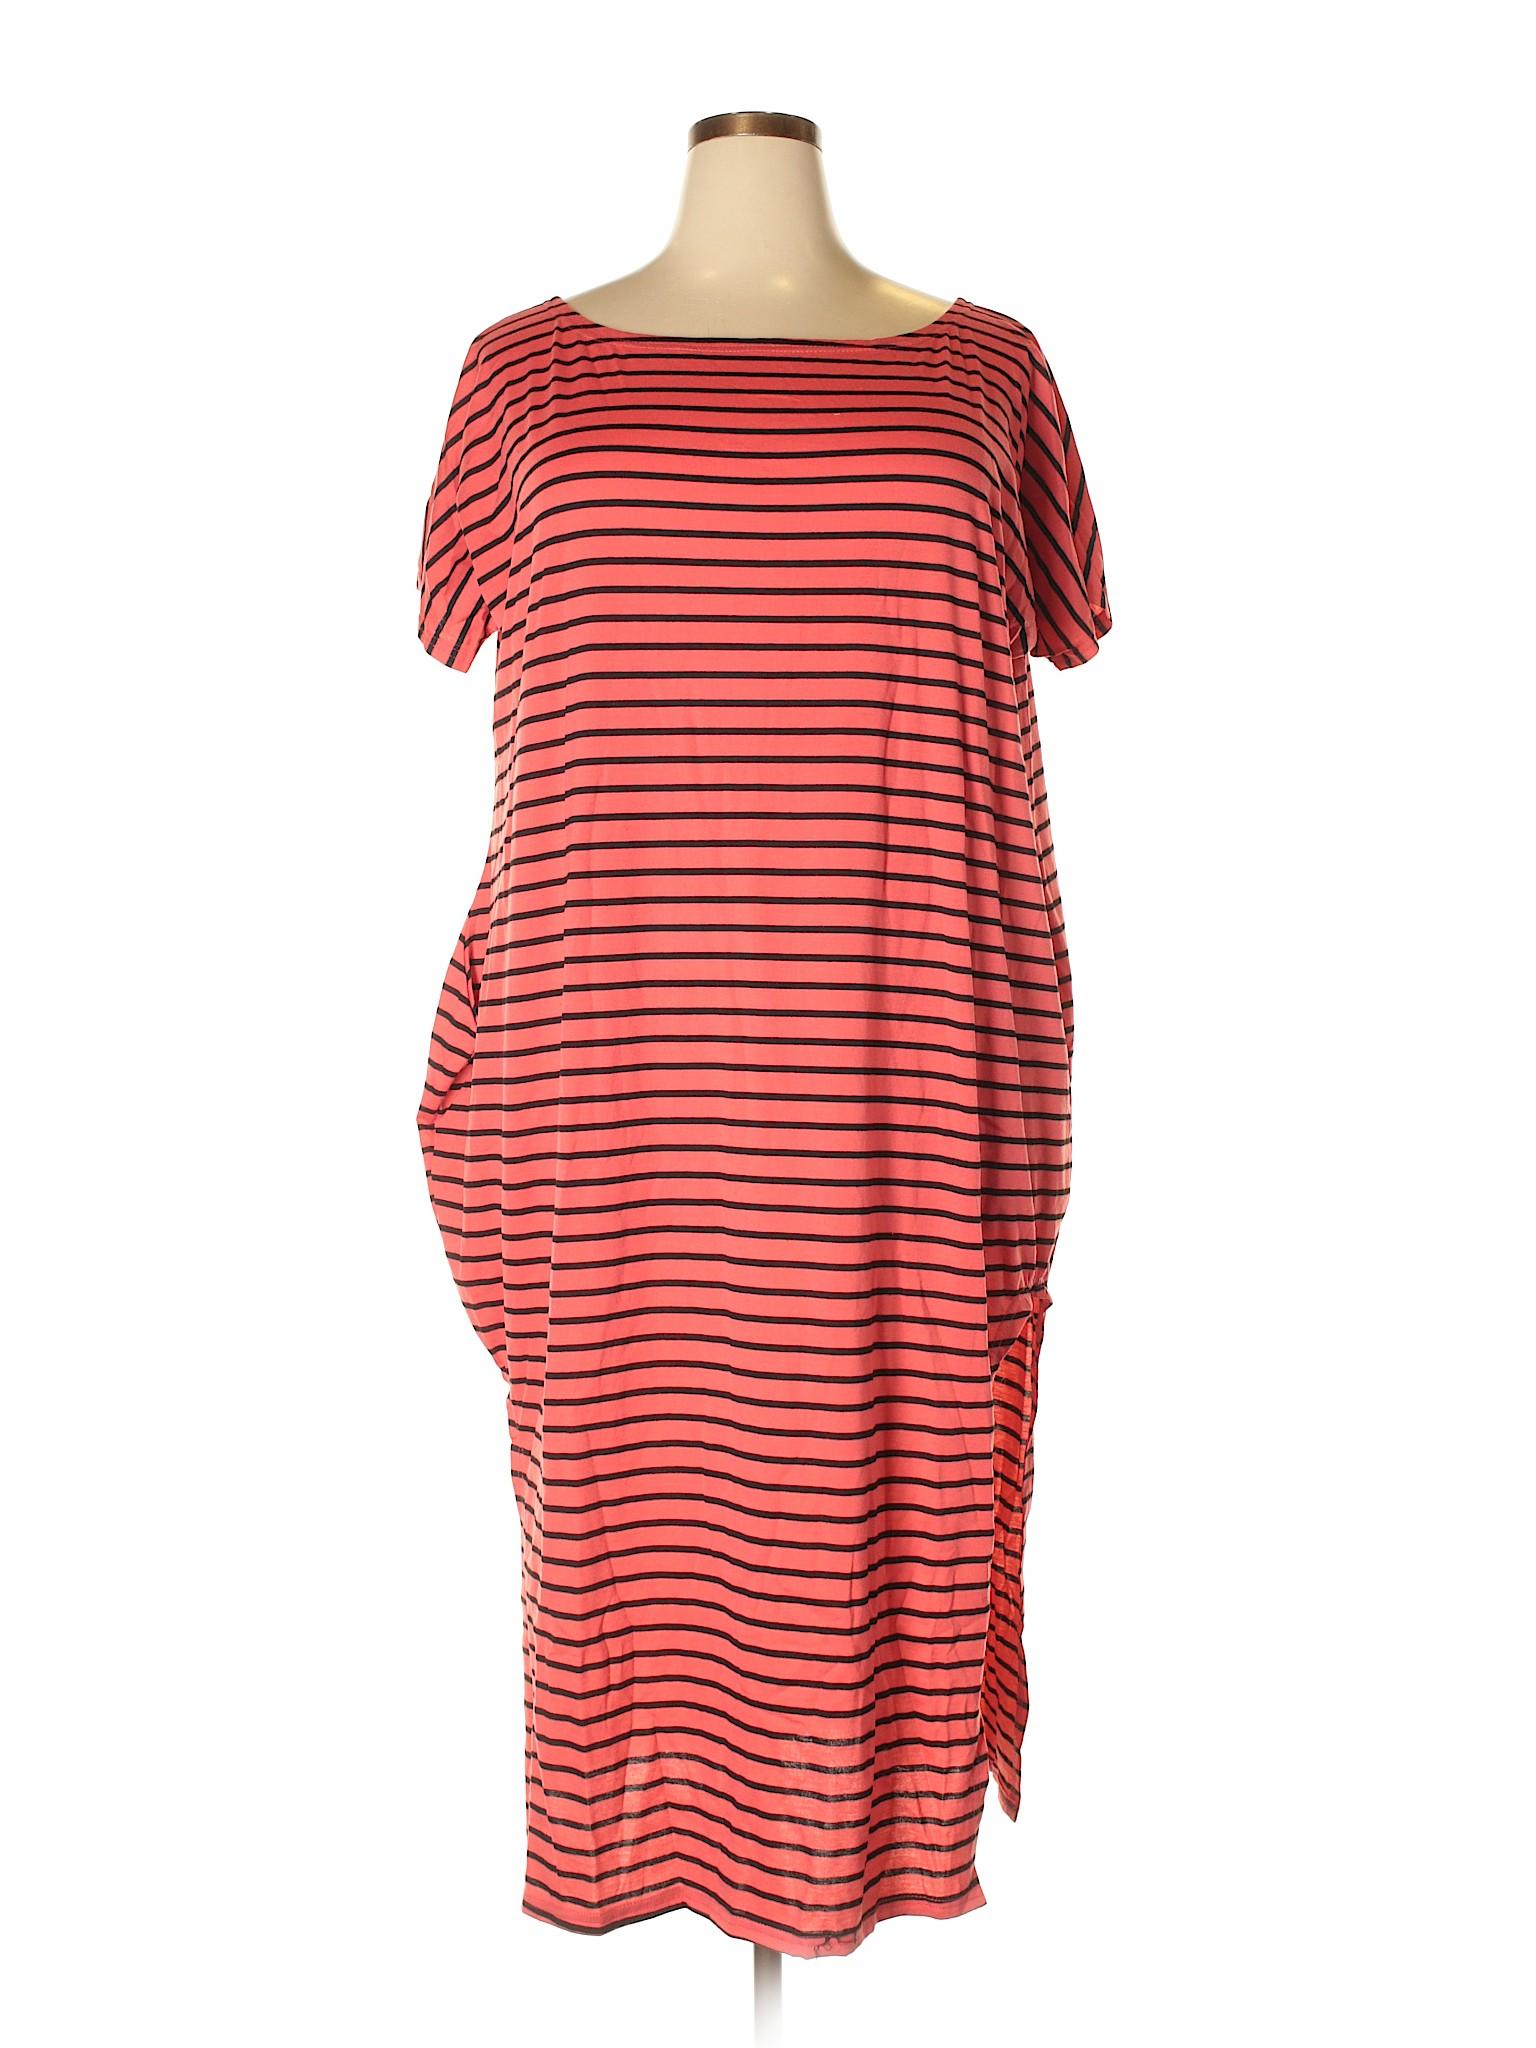 Collection Casual winter Zanzea Boutique Dress tq1naEU